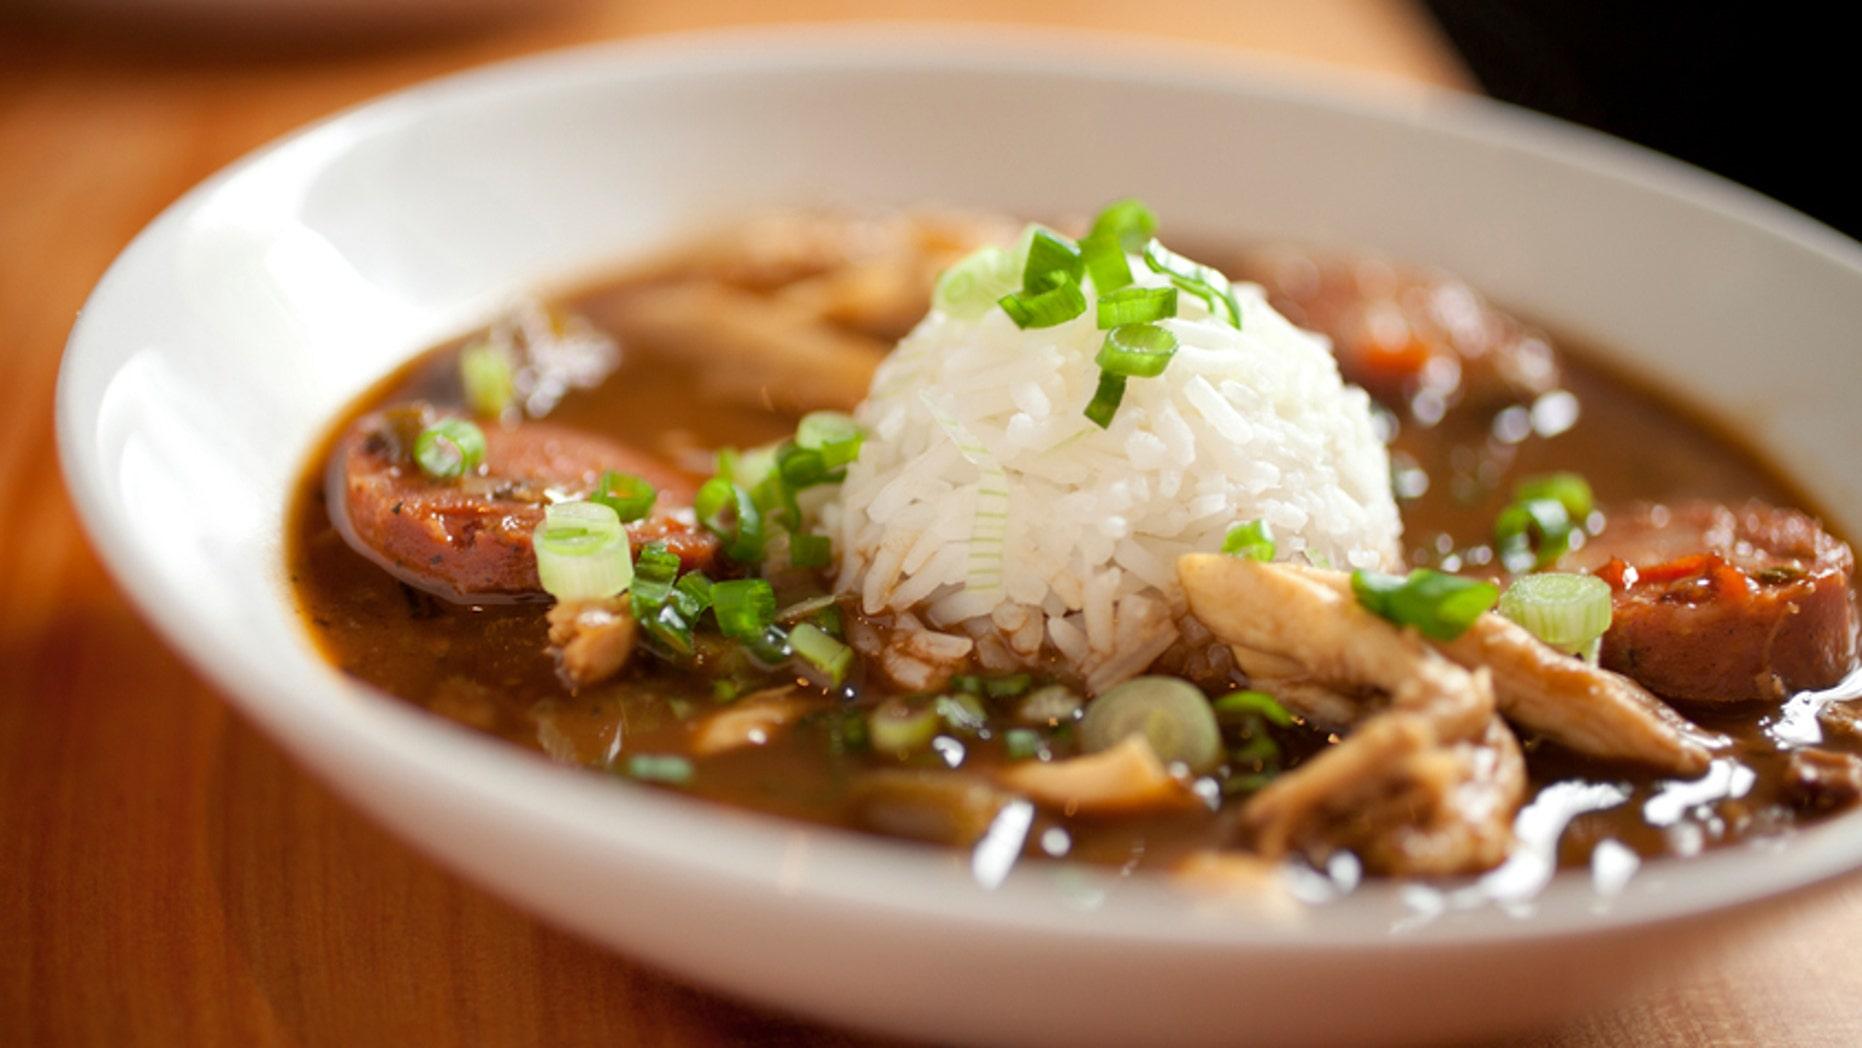 Do kale and quinoa belong in gumbo? Disney says yes. Louisiana says no.